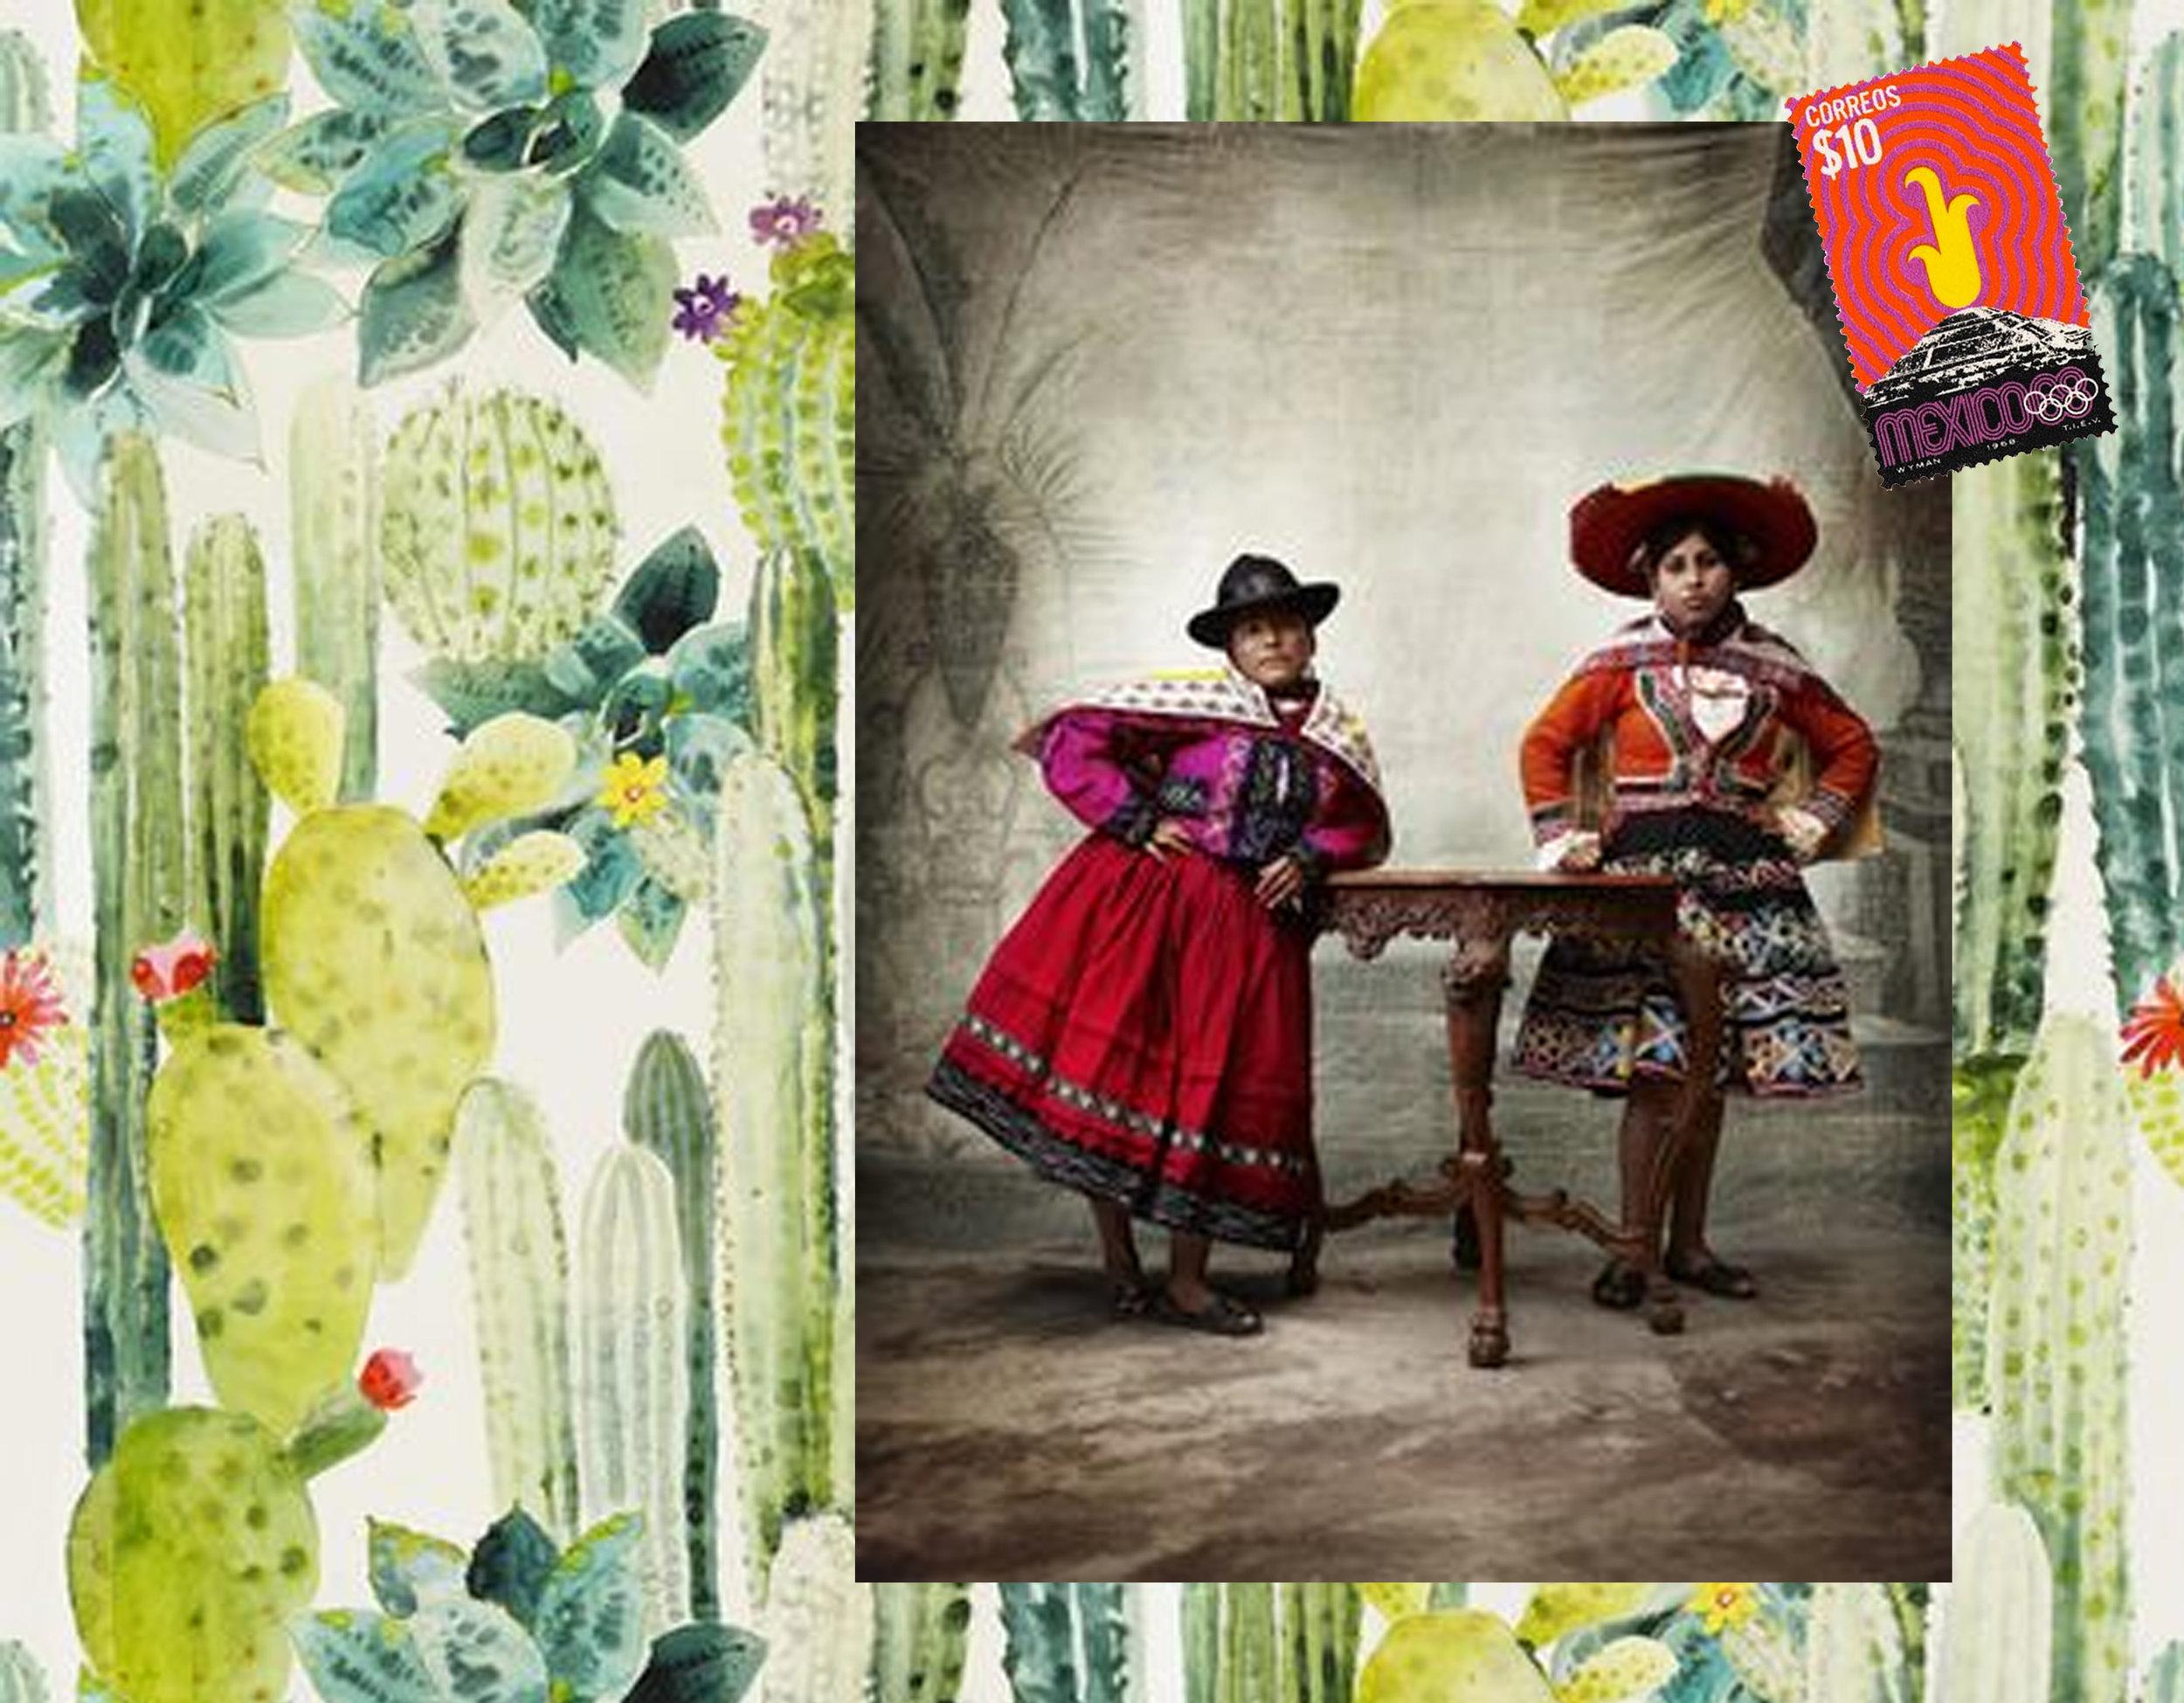 Cuilko wallpaper  Pierre Frey  - photograph by Mario Testino via  Olivia Palermo  - Mexicn stamp via  Una Vida Moderna